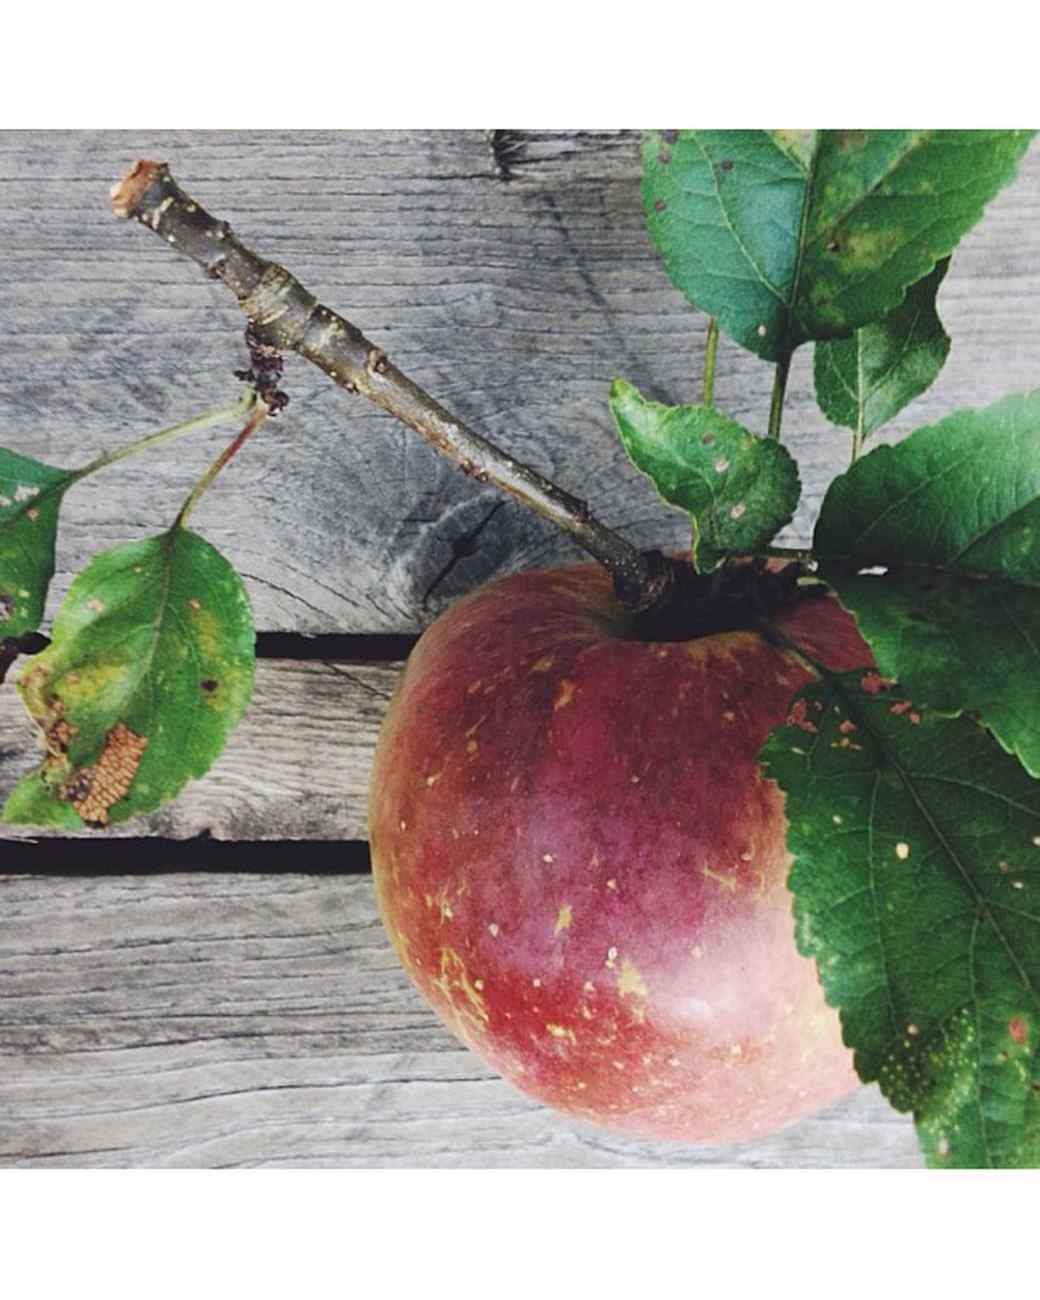 halloween-hunt-ugc-apples-rootedinthevalley.jpg